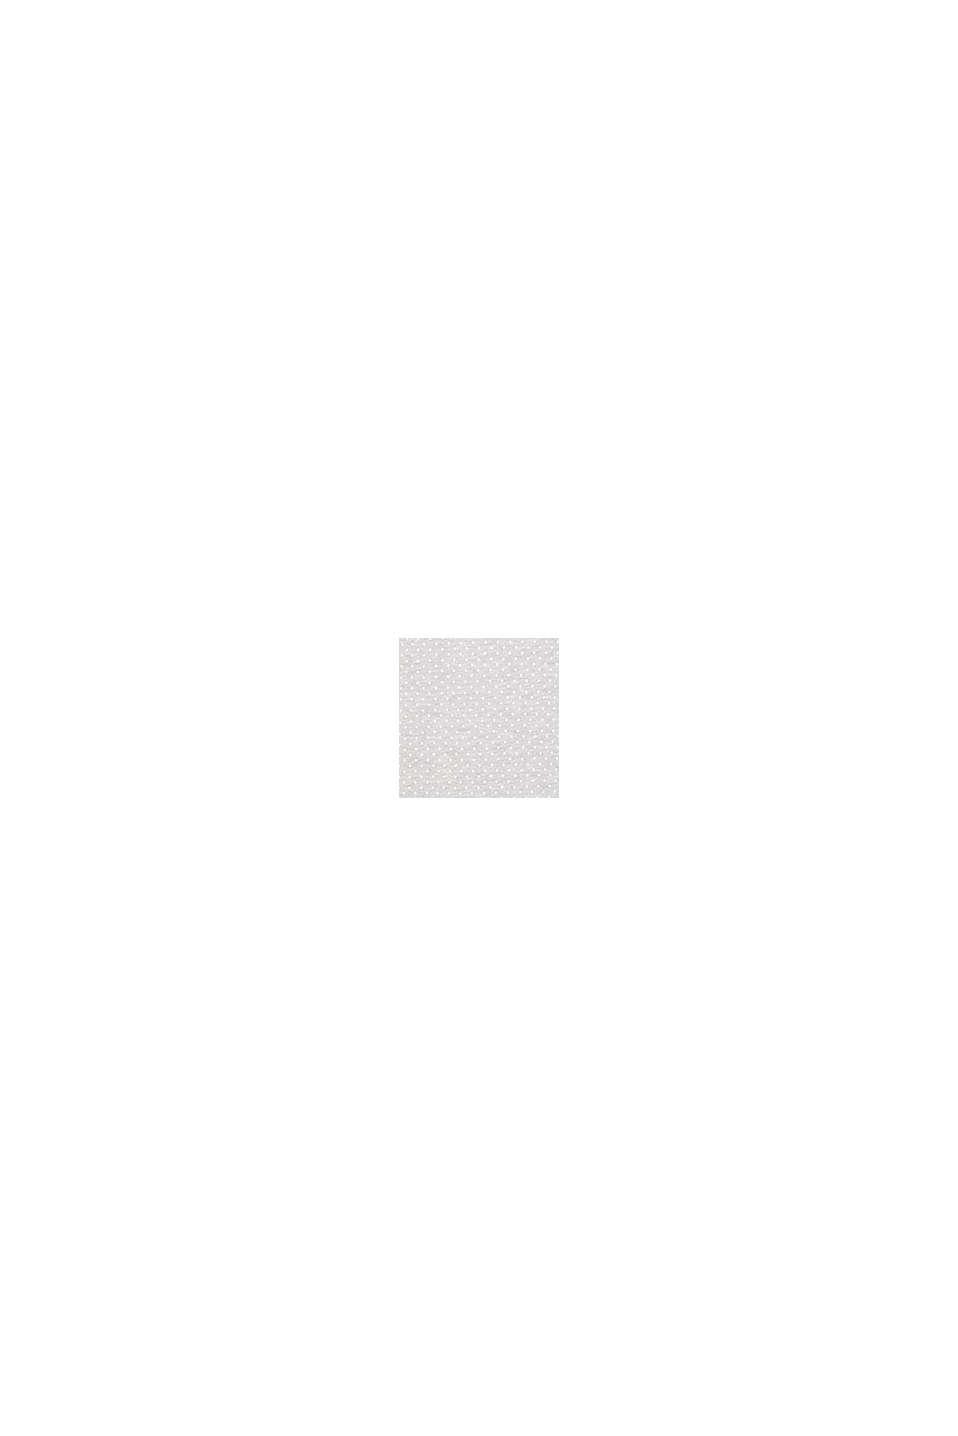 MODERN COTTON Nachthemd, LIGHT GREY, swatch